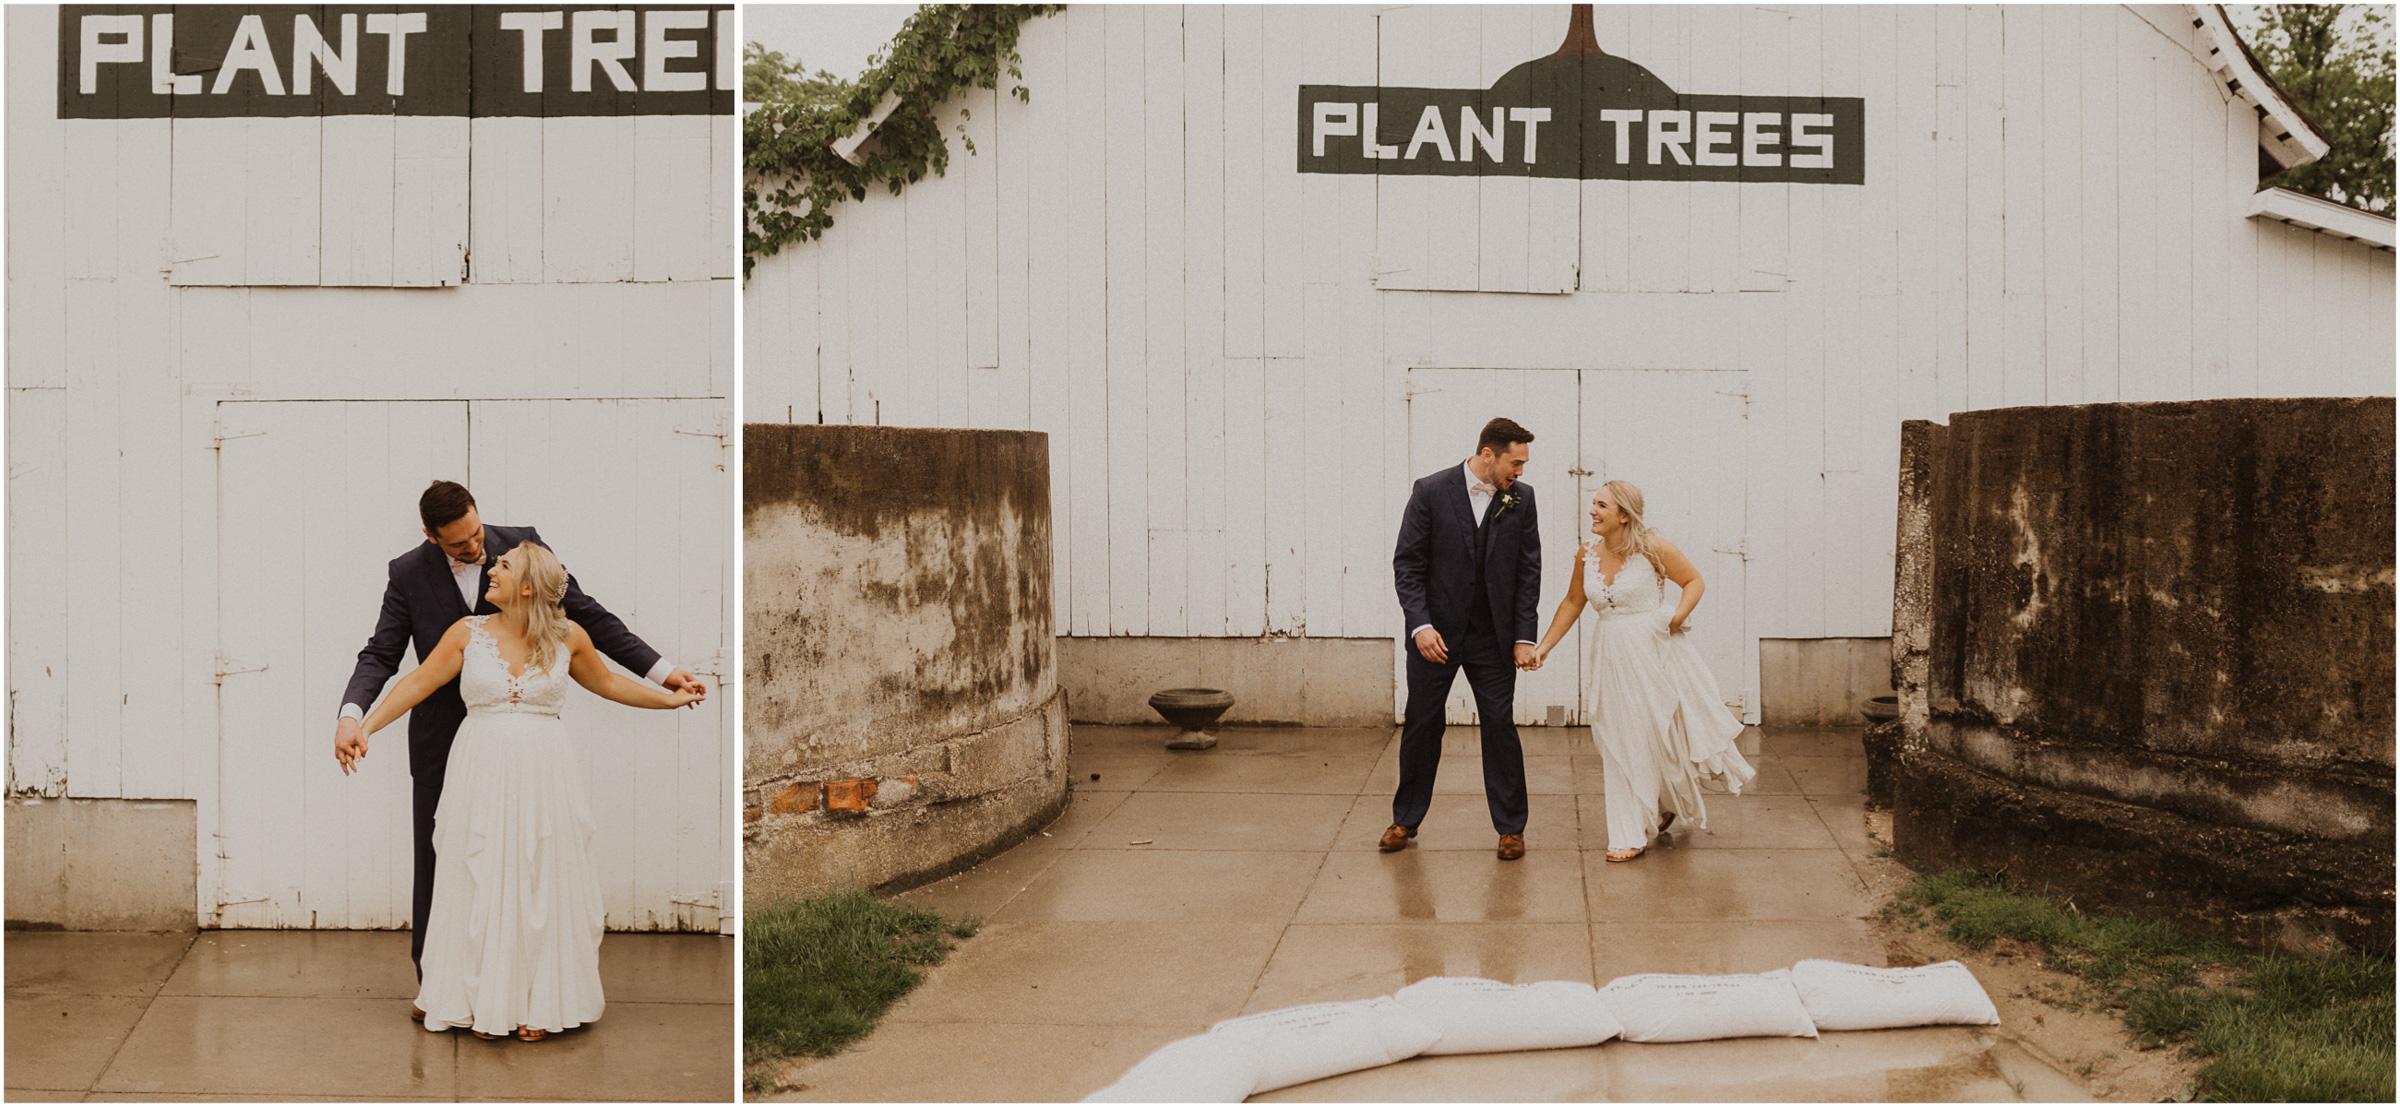 alyssa barletter photography nelson wedding nebraska city lied lodge morton barn spring wedding photographer-44.jpg